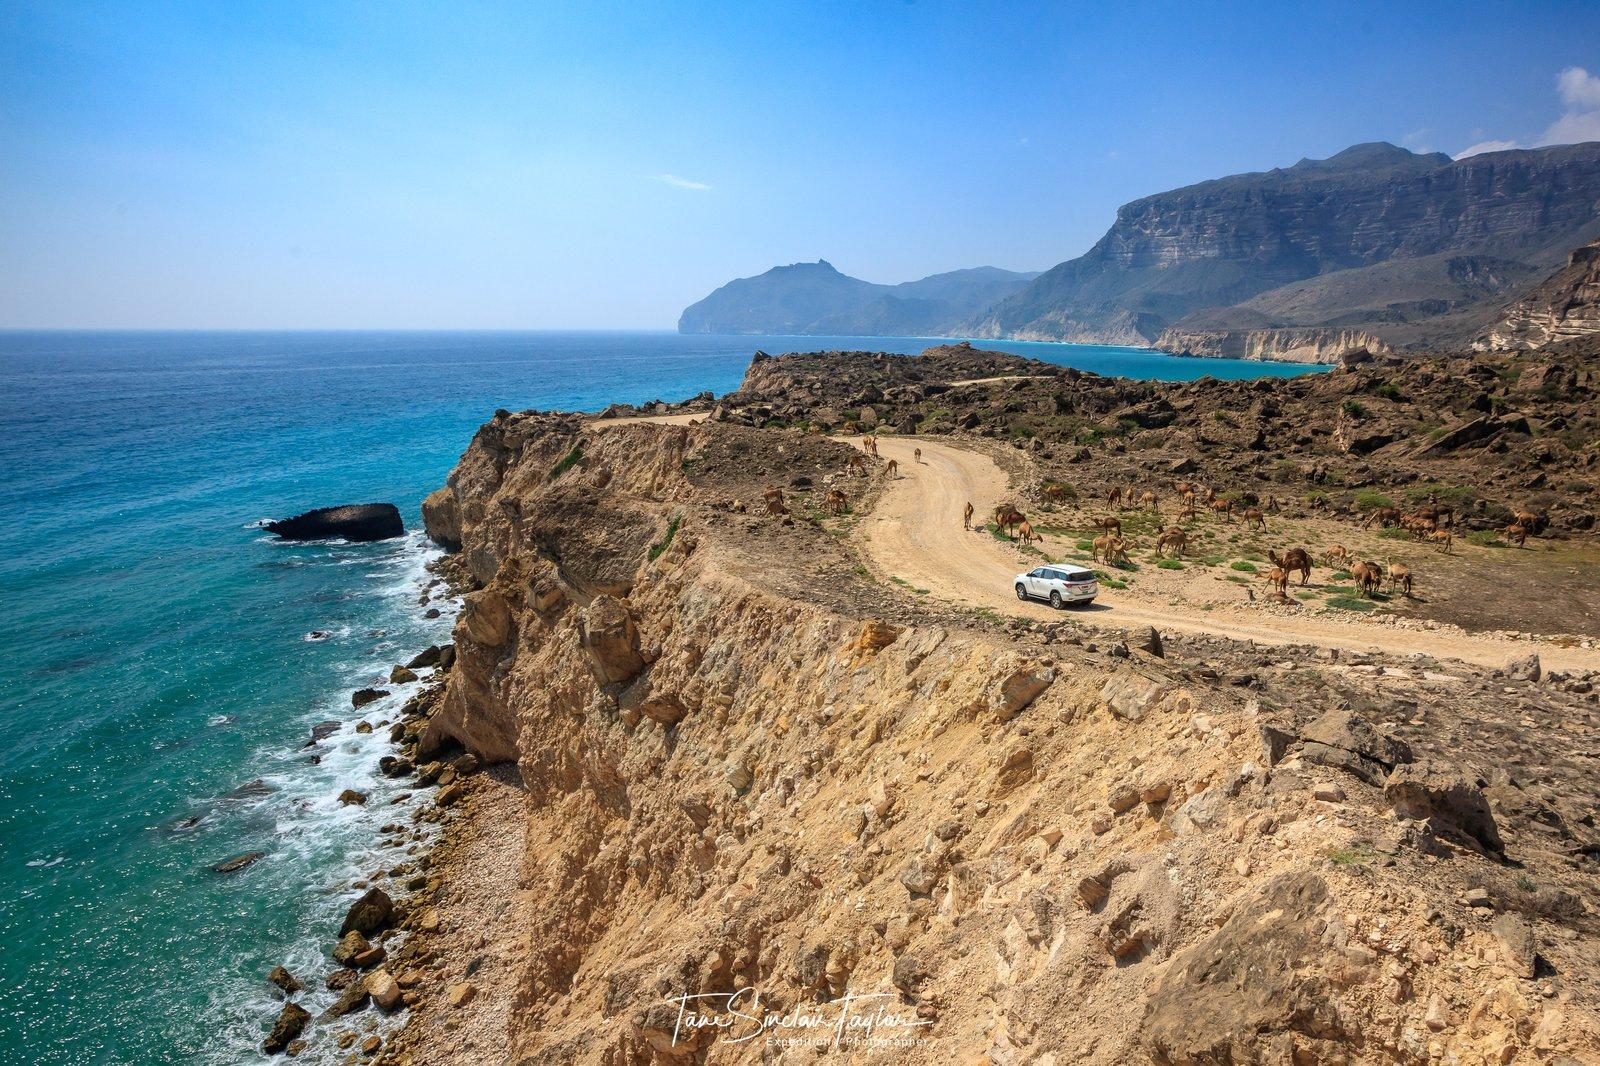 Sampling site near Southern Dhofar region of Oman